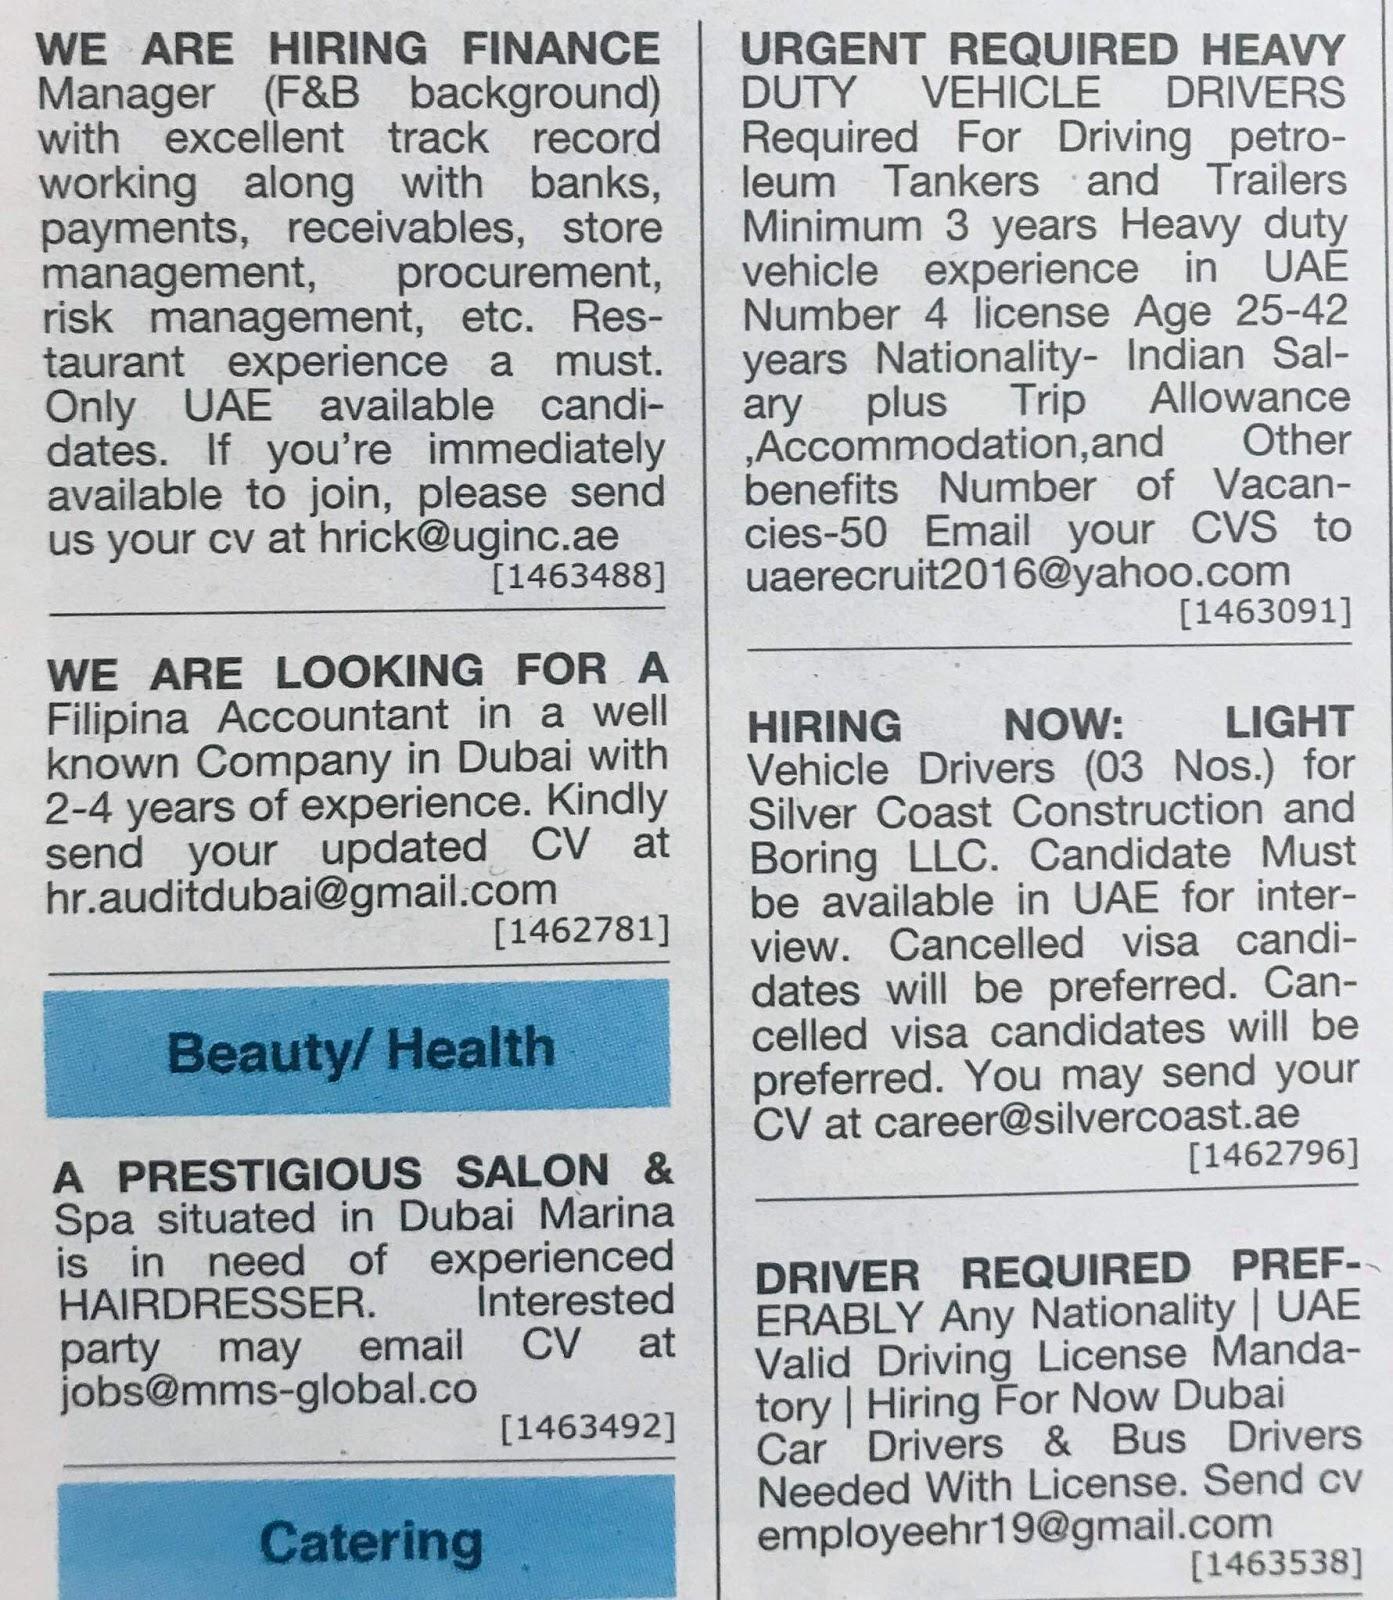 Career in UAE Local Hiring Jobs Khaleej Times-UAE-1612933